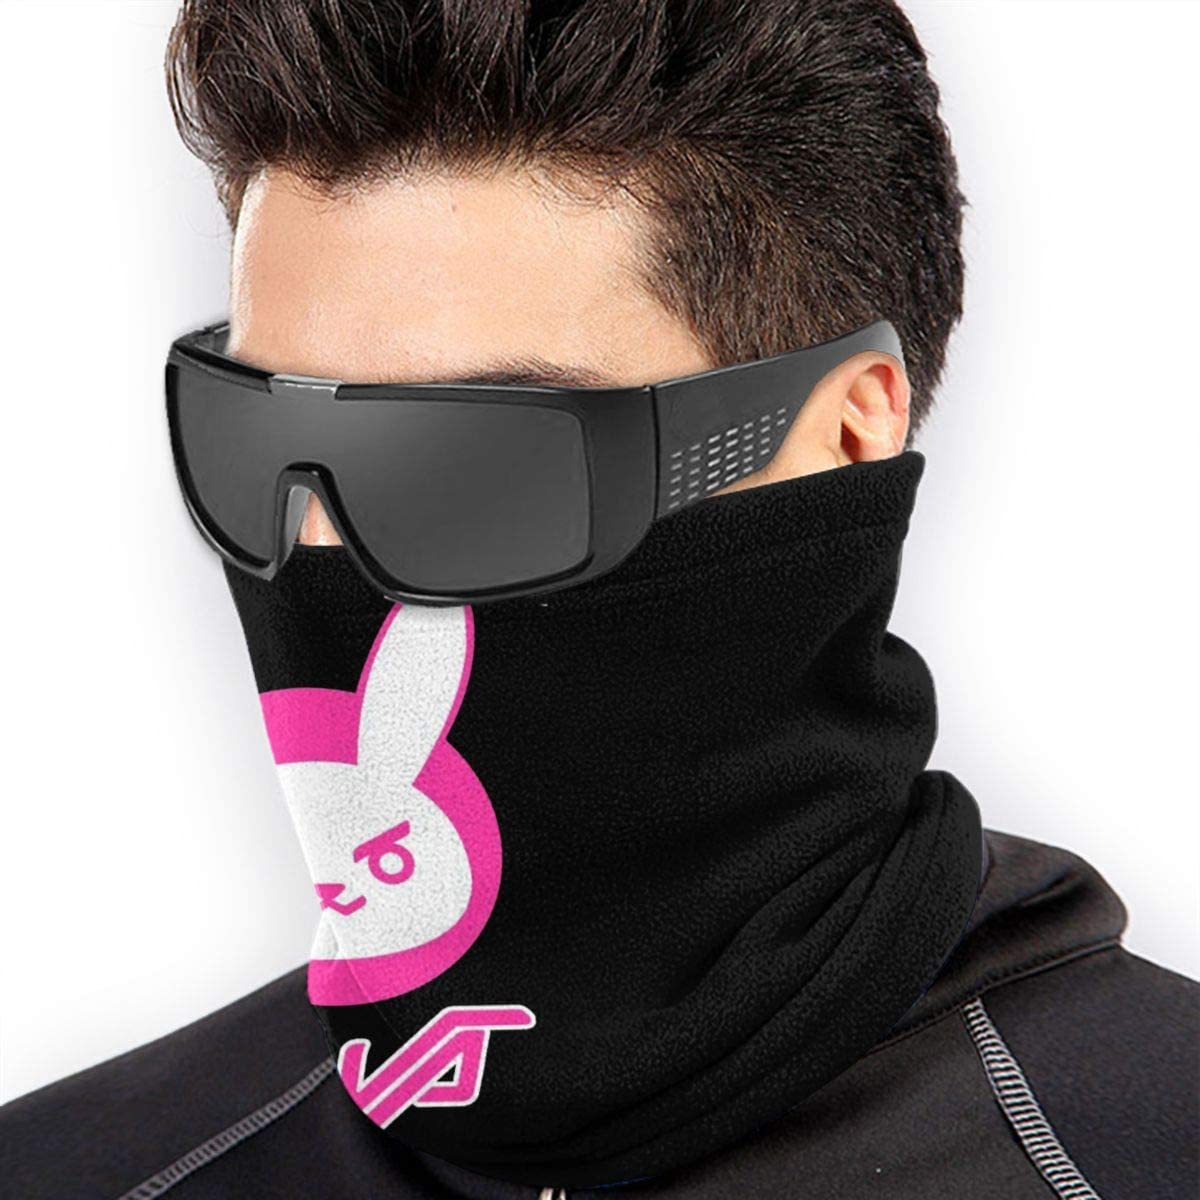 Unisex Windproof and Dustproof Neck Warm Scarf Overwatch Dva Bunny Logo Original Casual Customization Black